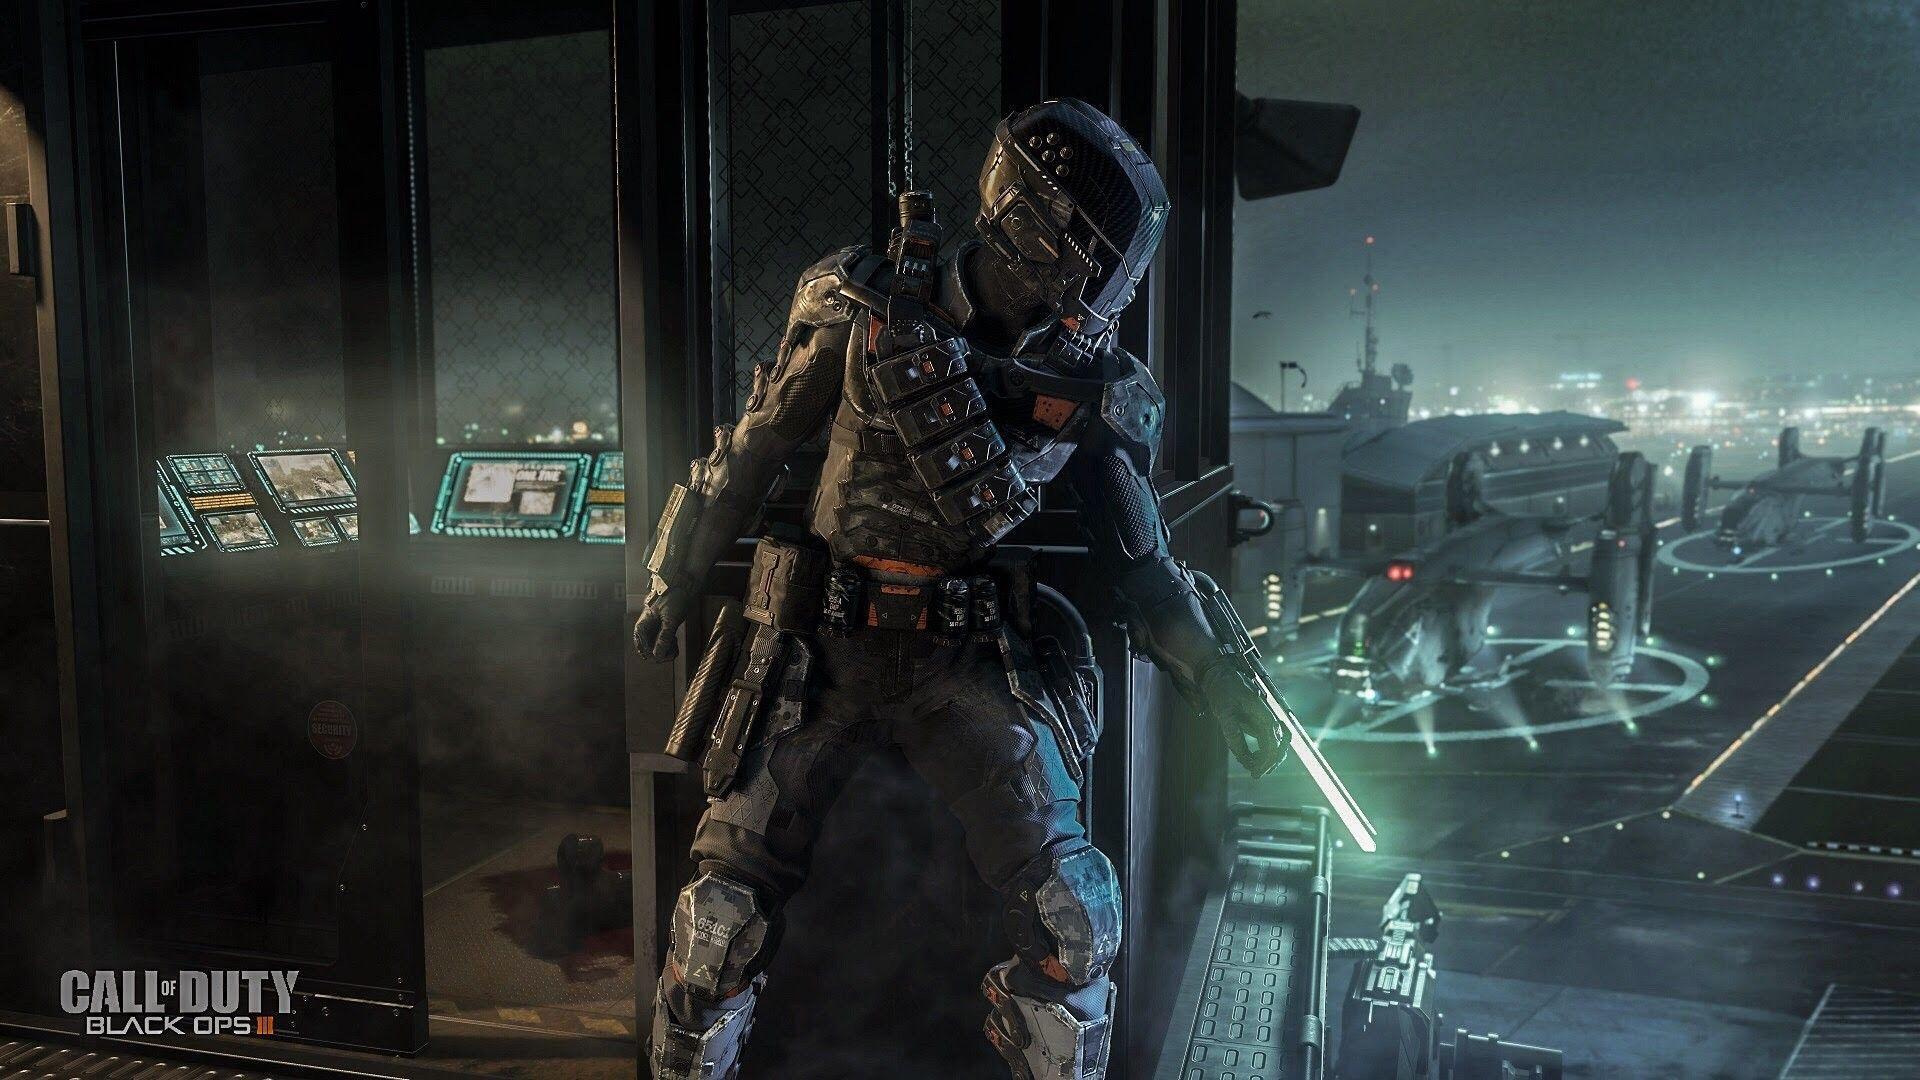 Reaper Bo3 Wallpapers Top Free Reaper Bo3 Backgrounds